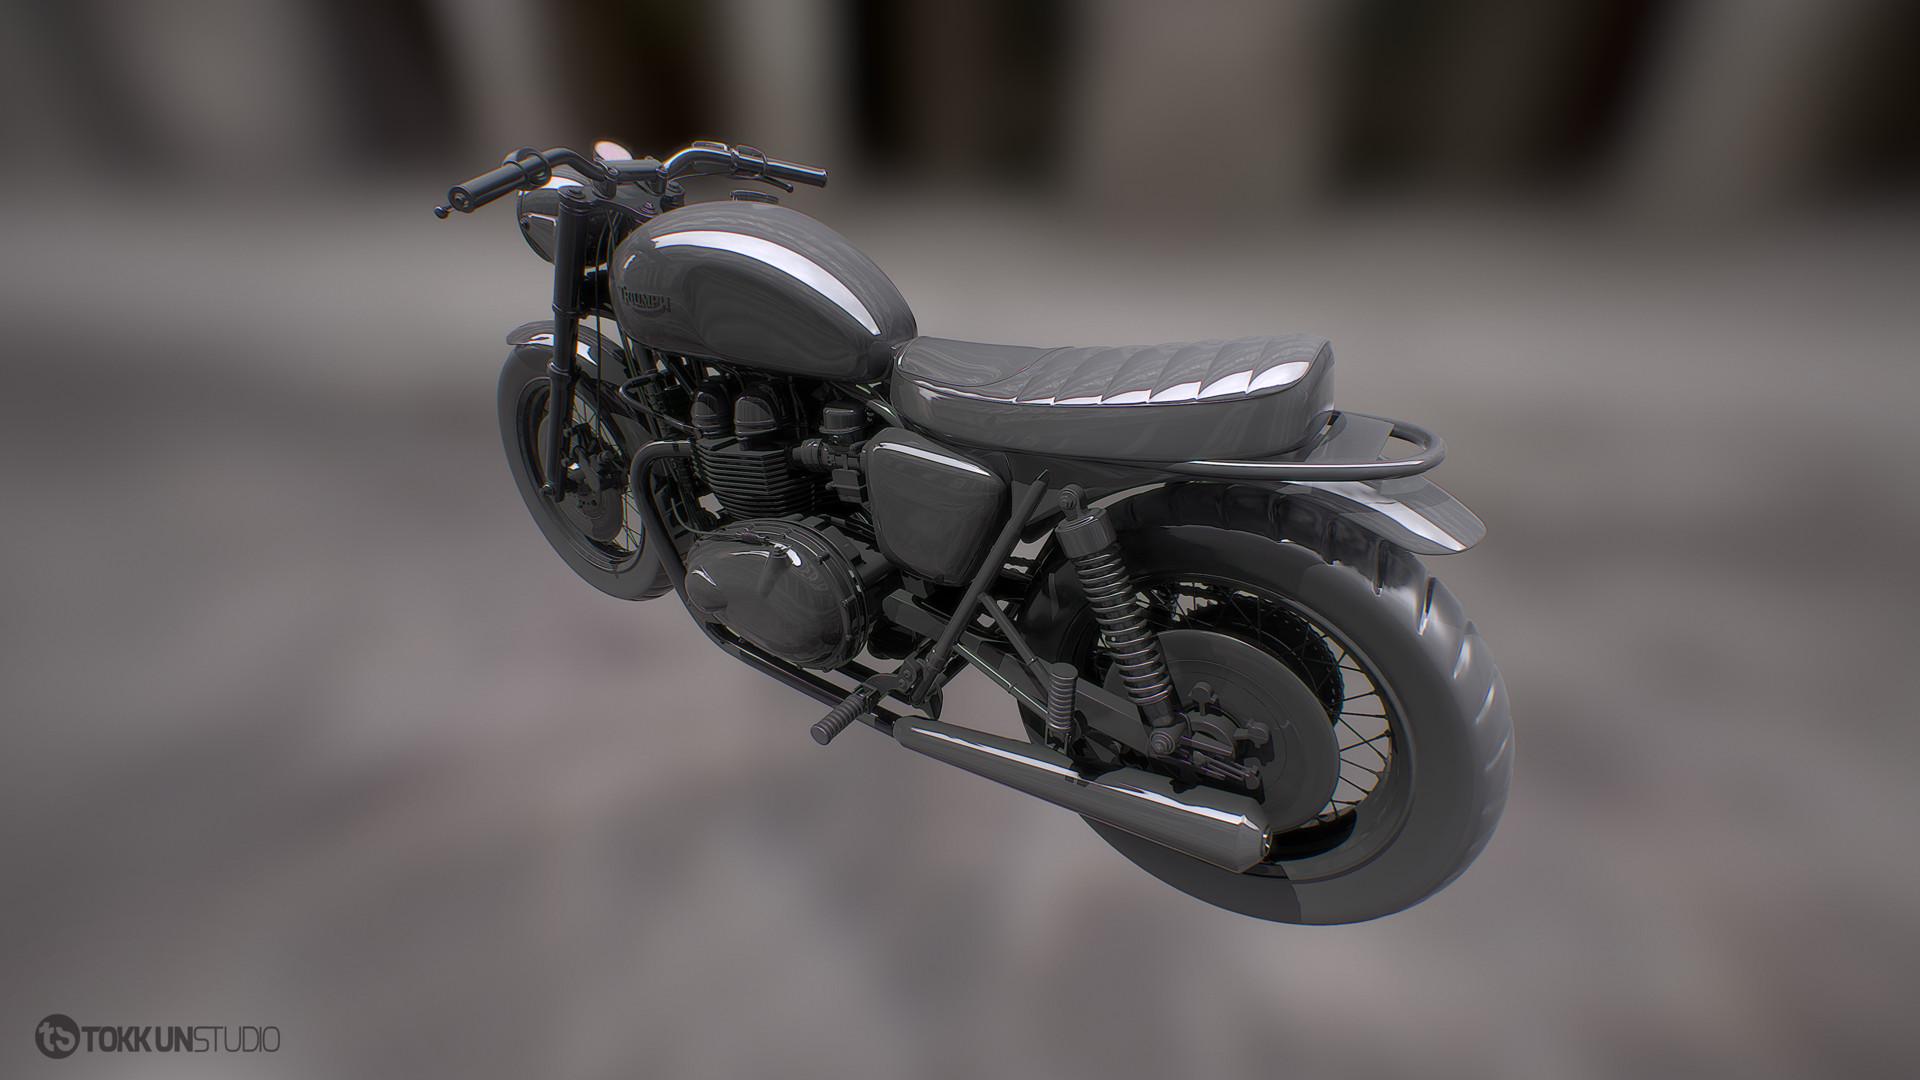 Tokkun studio bike 2ts